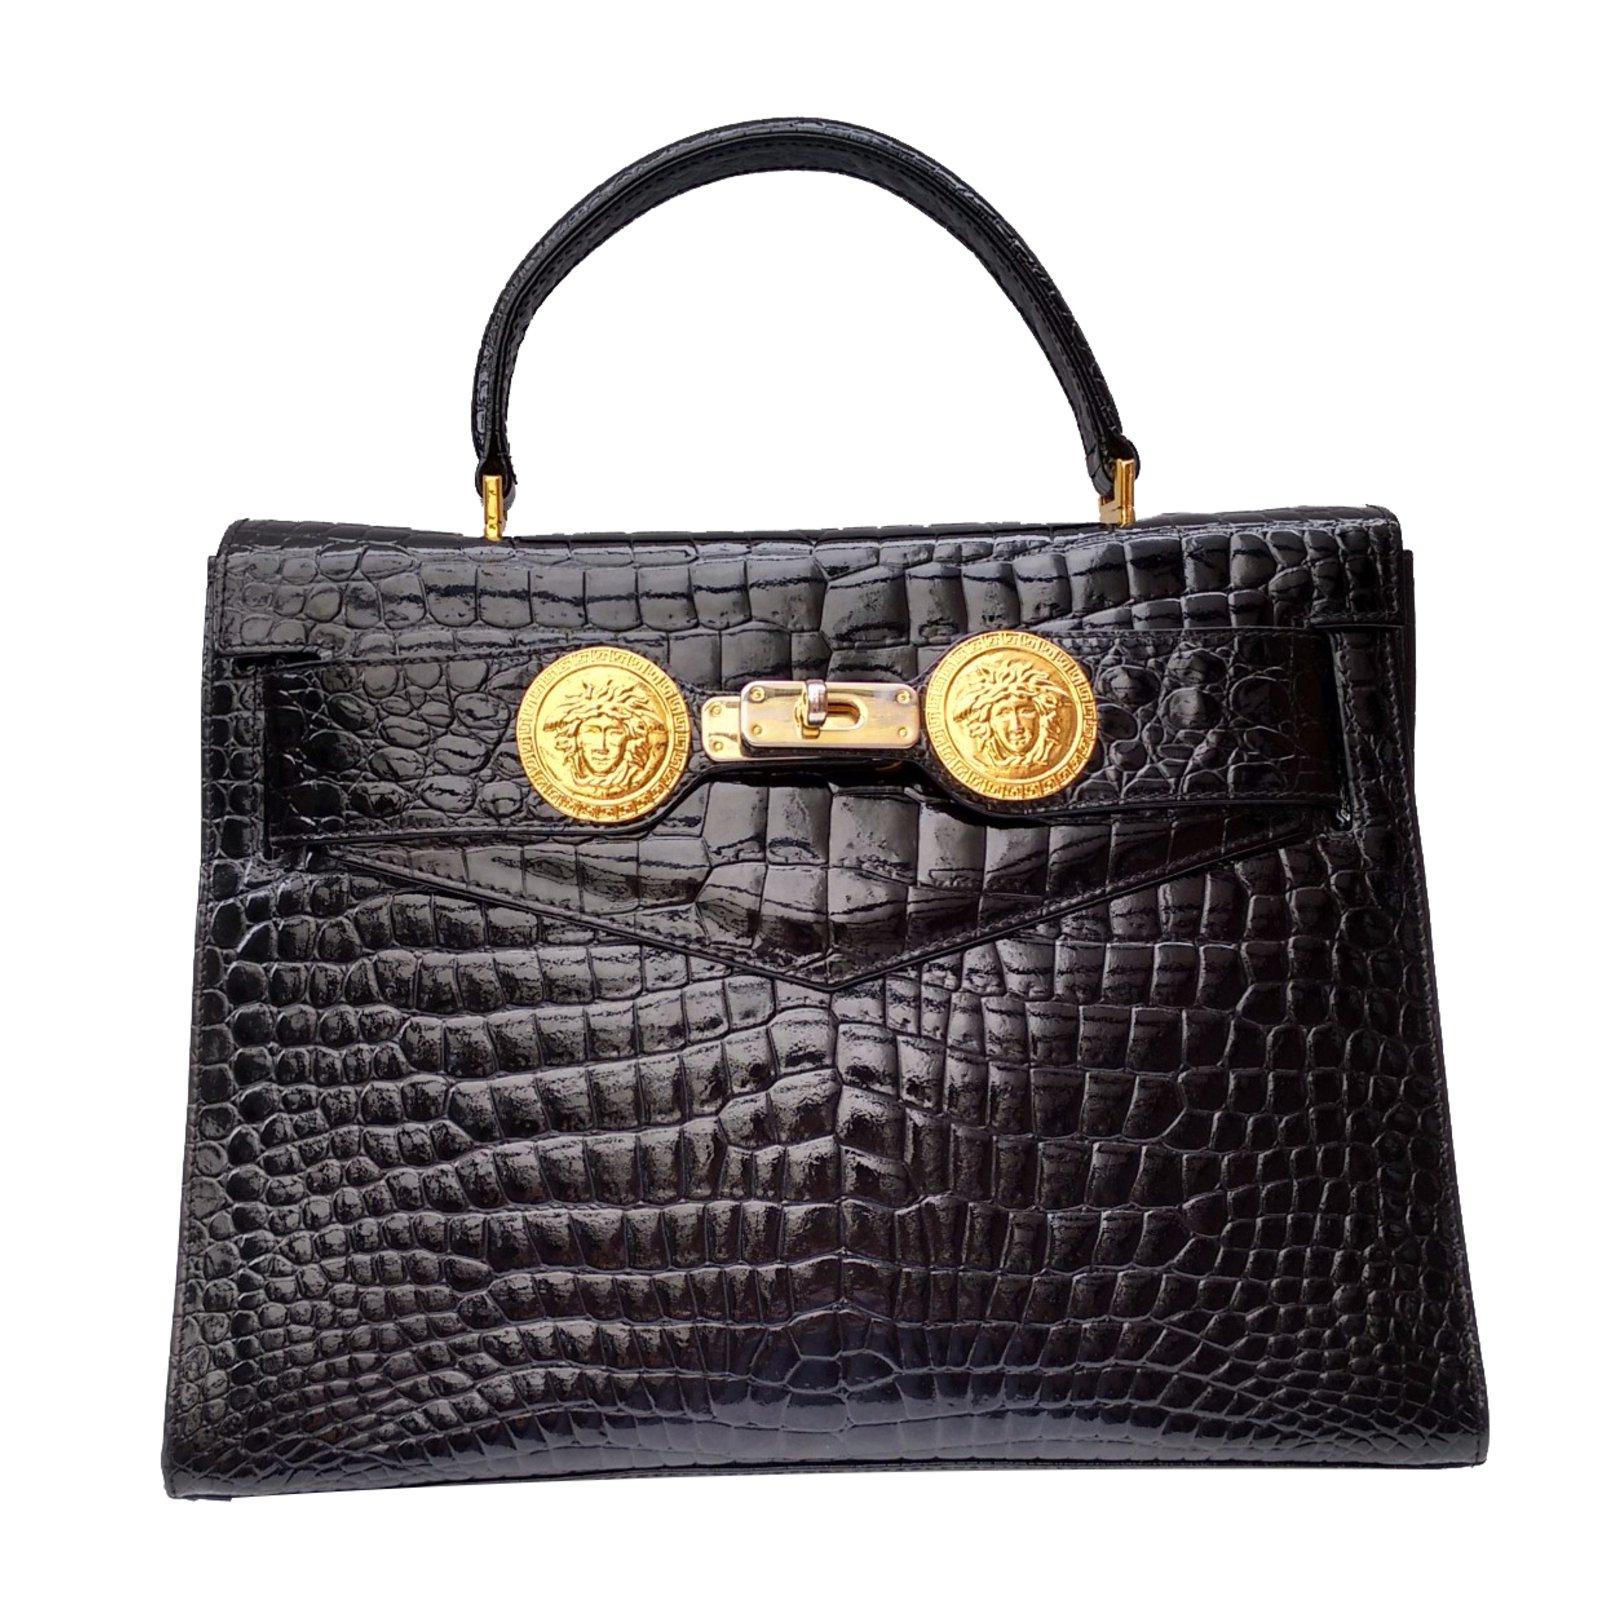 Gianni Versace Handbag Handbags Patent leather Black ref.28199 ... 85c957d832bf0